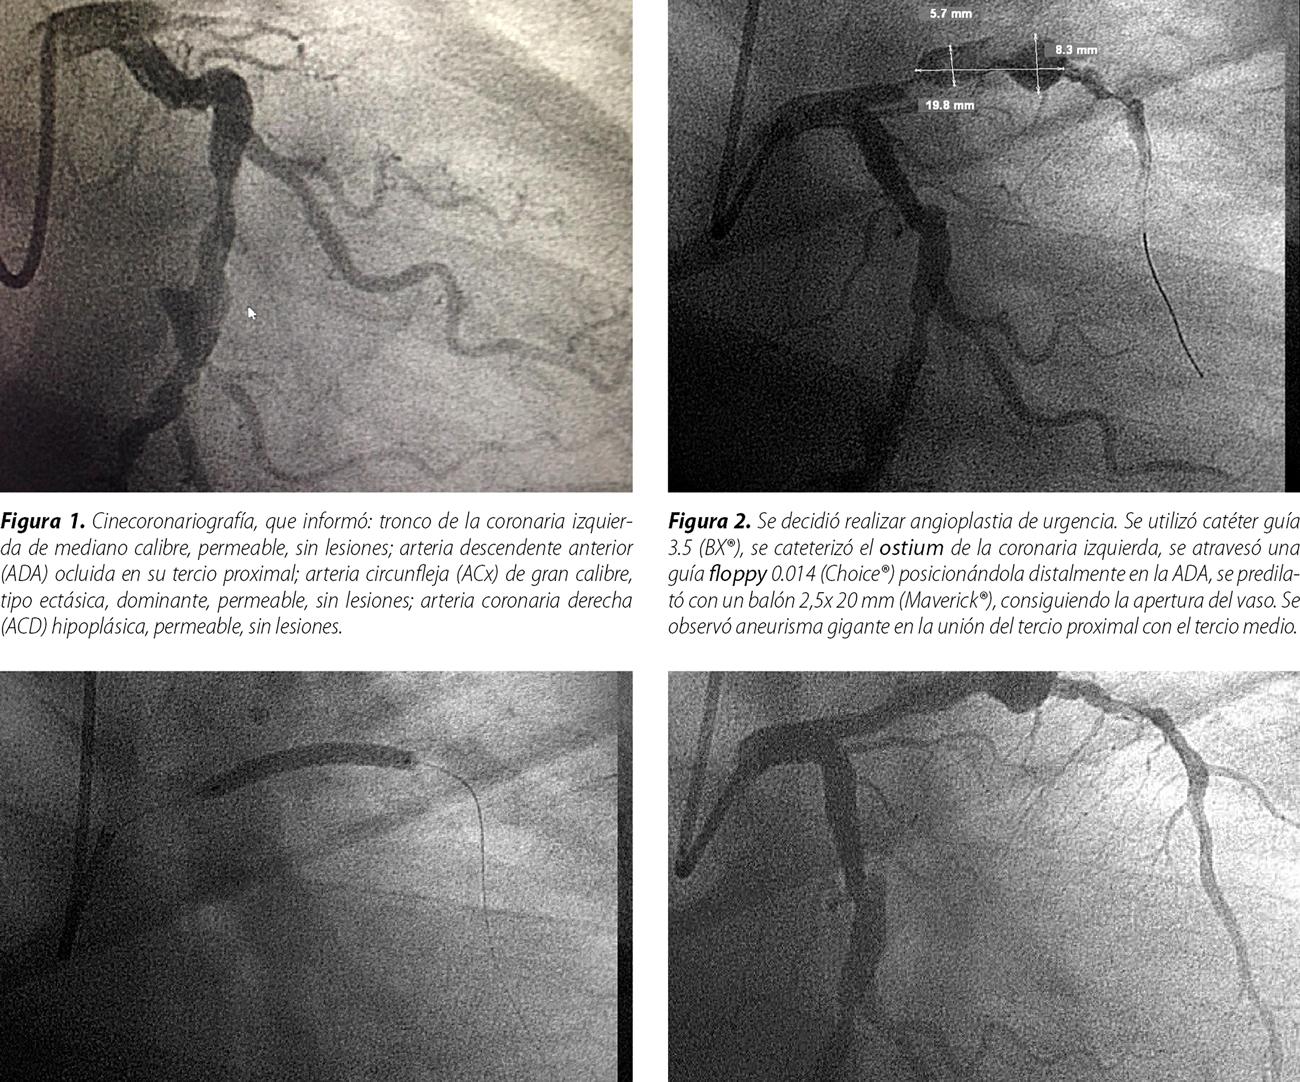 Aneurisma coronario, hallazgo en el síndrome coronario agudo con supradesnivel del segmento ST